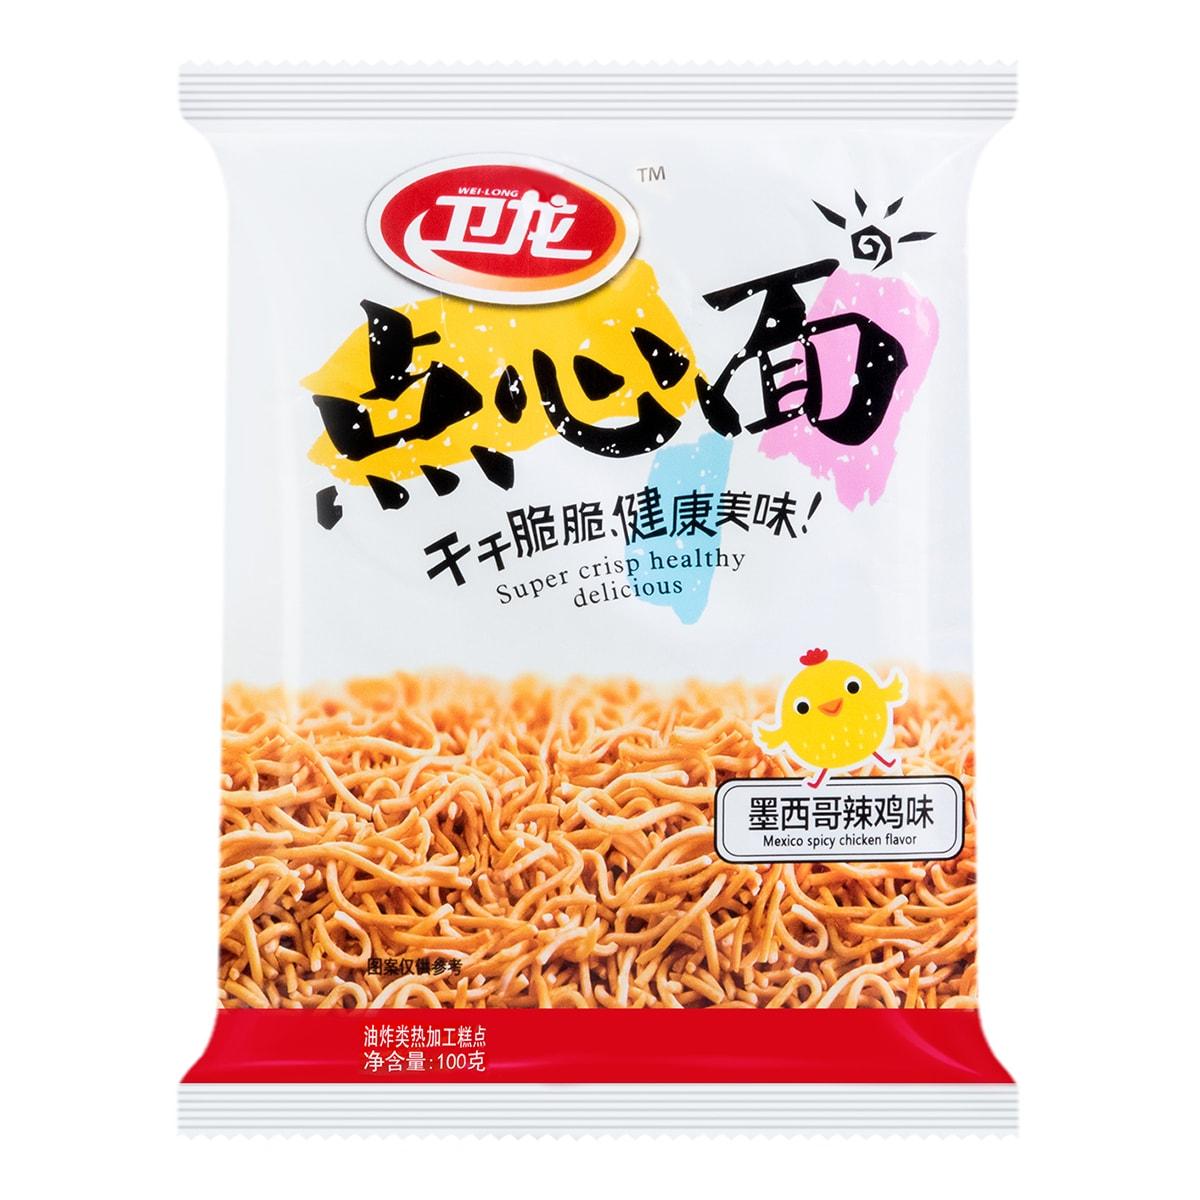 WEILONG Noodle Snack Mexico Spicy Chicken Flavor 100g